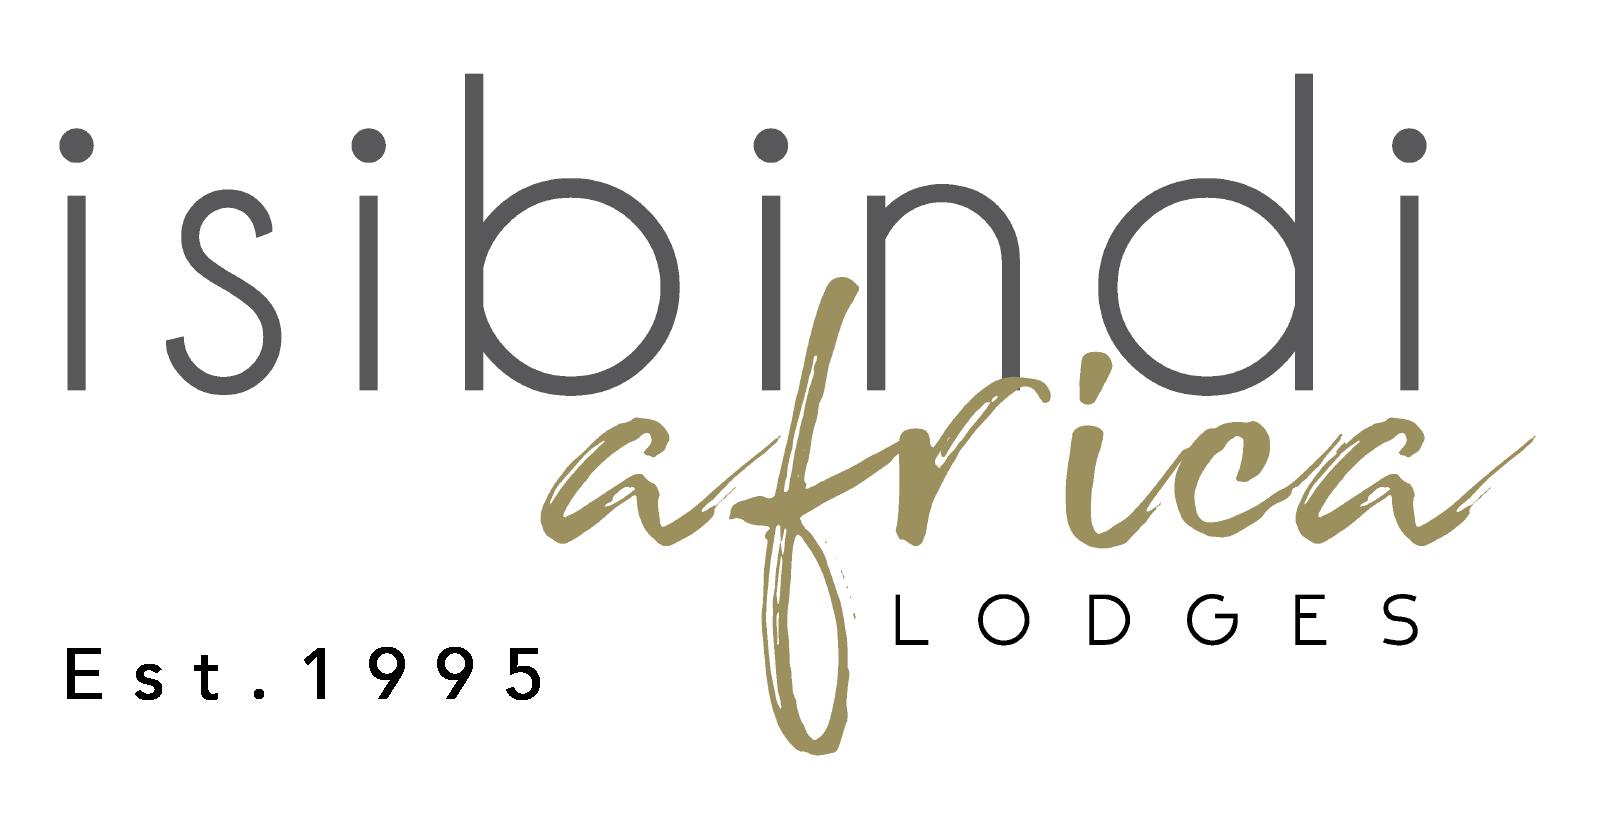 IsibindiAfrica_Logo1_est.1995-01